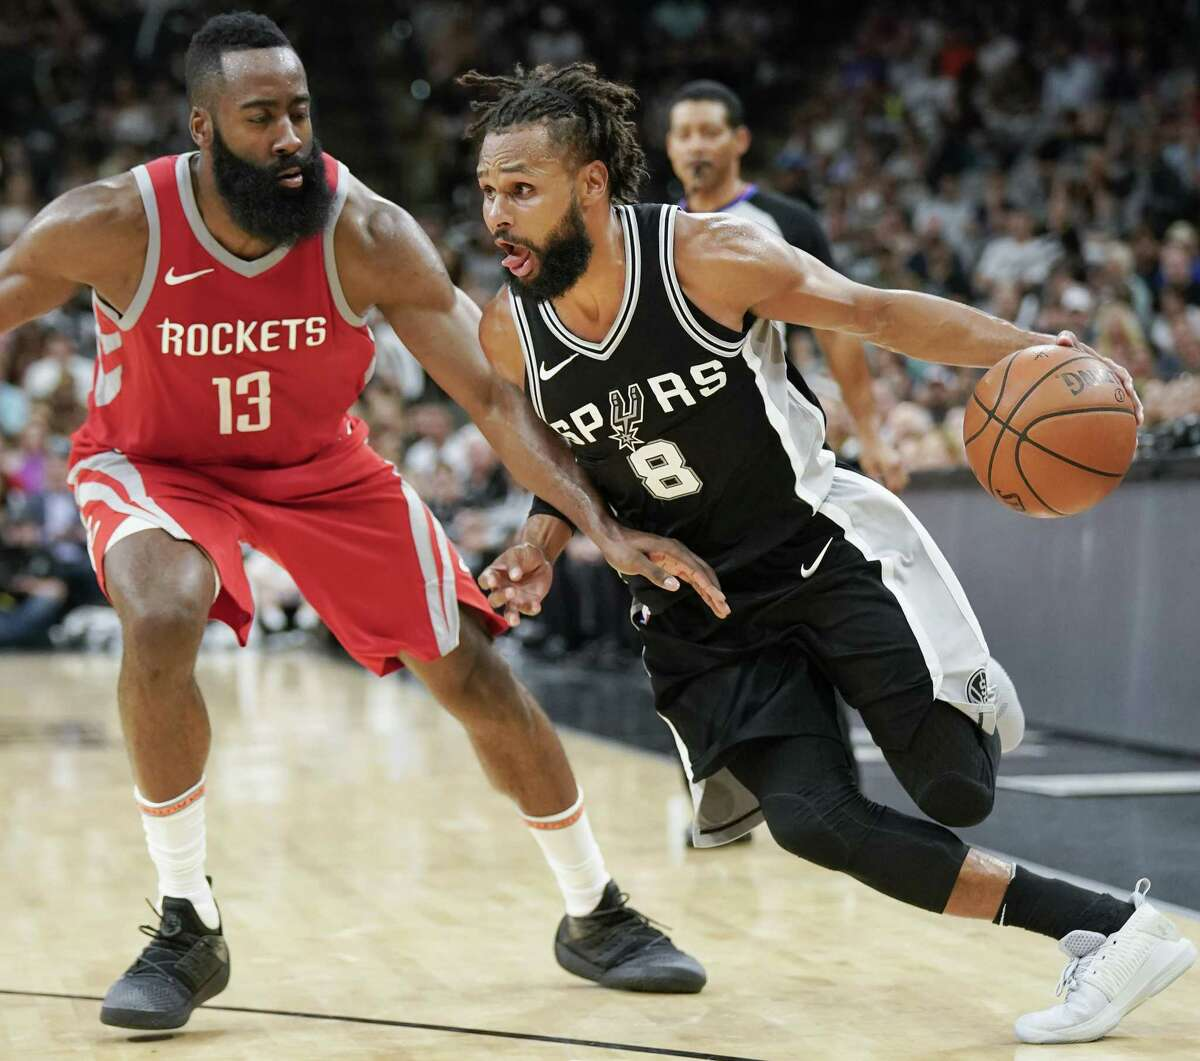 San Antonio Spurs' Patty Mills (8) drives against Houston Rockets' James Harden during the second half of an NBA basketball game Sunday, April 1, 2018, in San Antonio. San Antonio won 100-83. (AP Photo/Darren Abate)